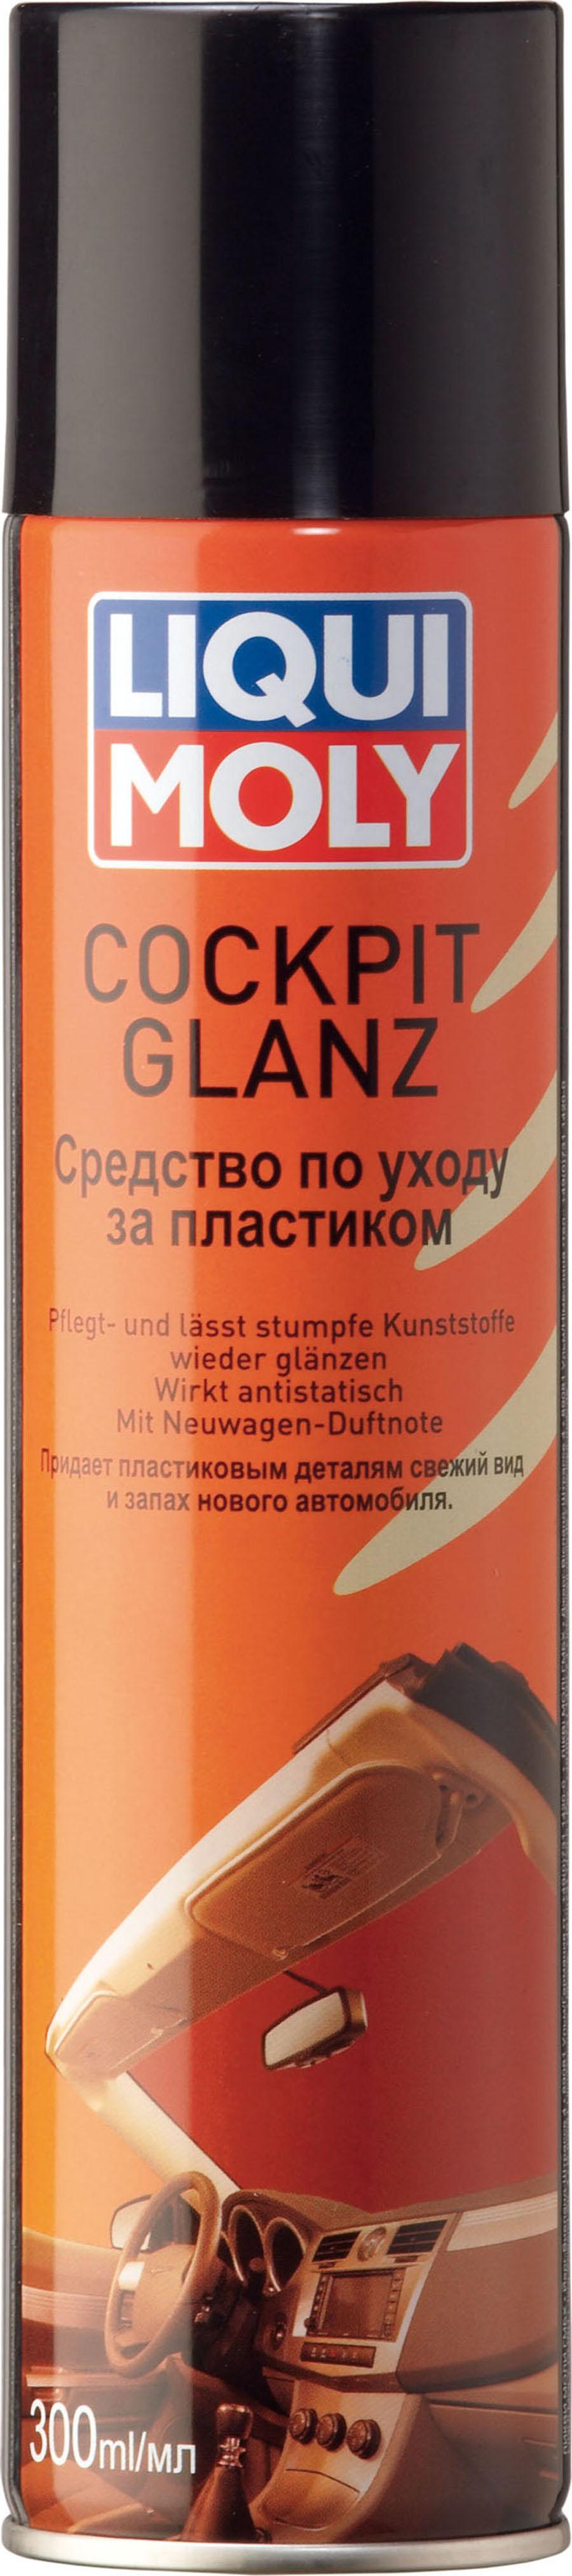 Средство для ухода за пластиком Cockpit Glanz